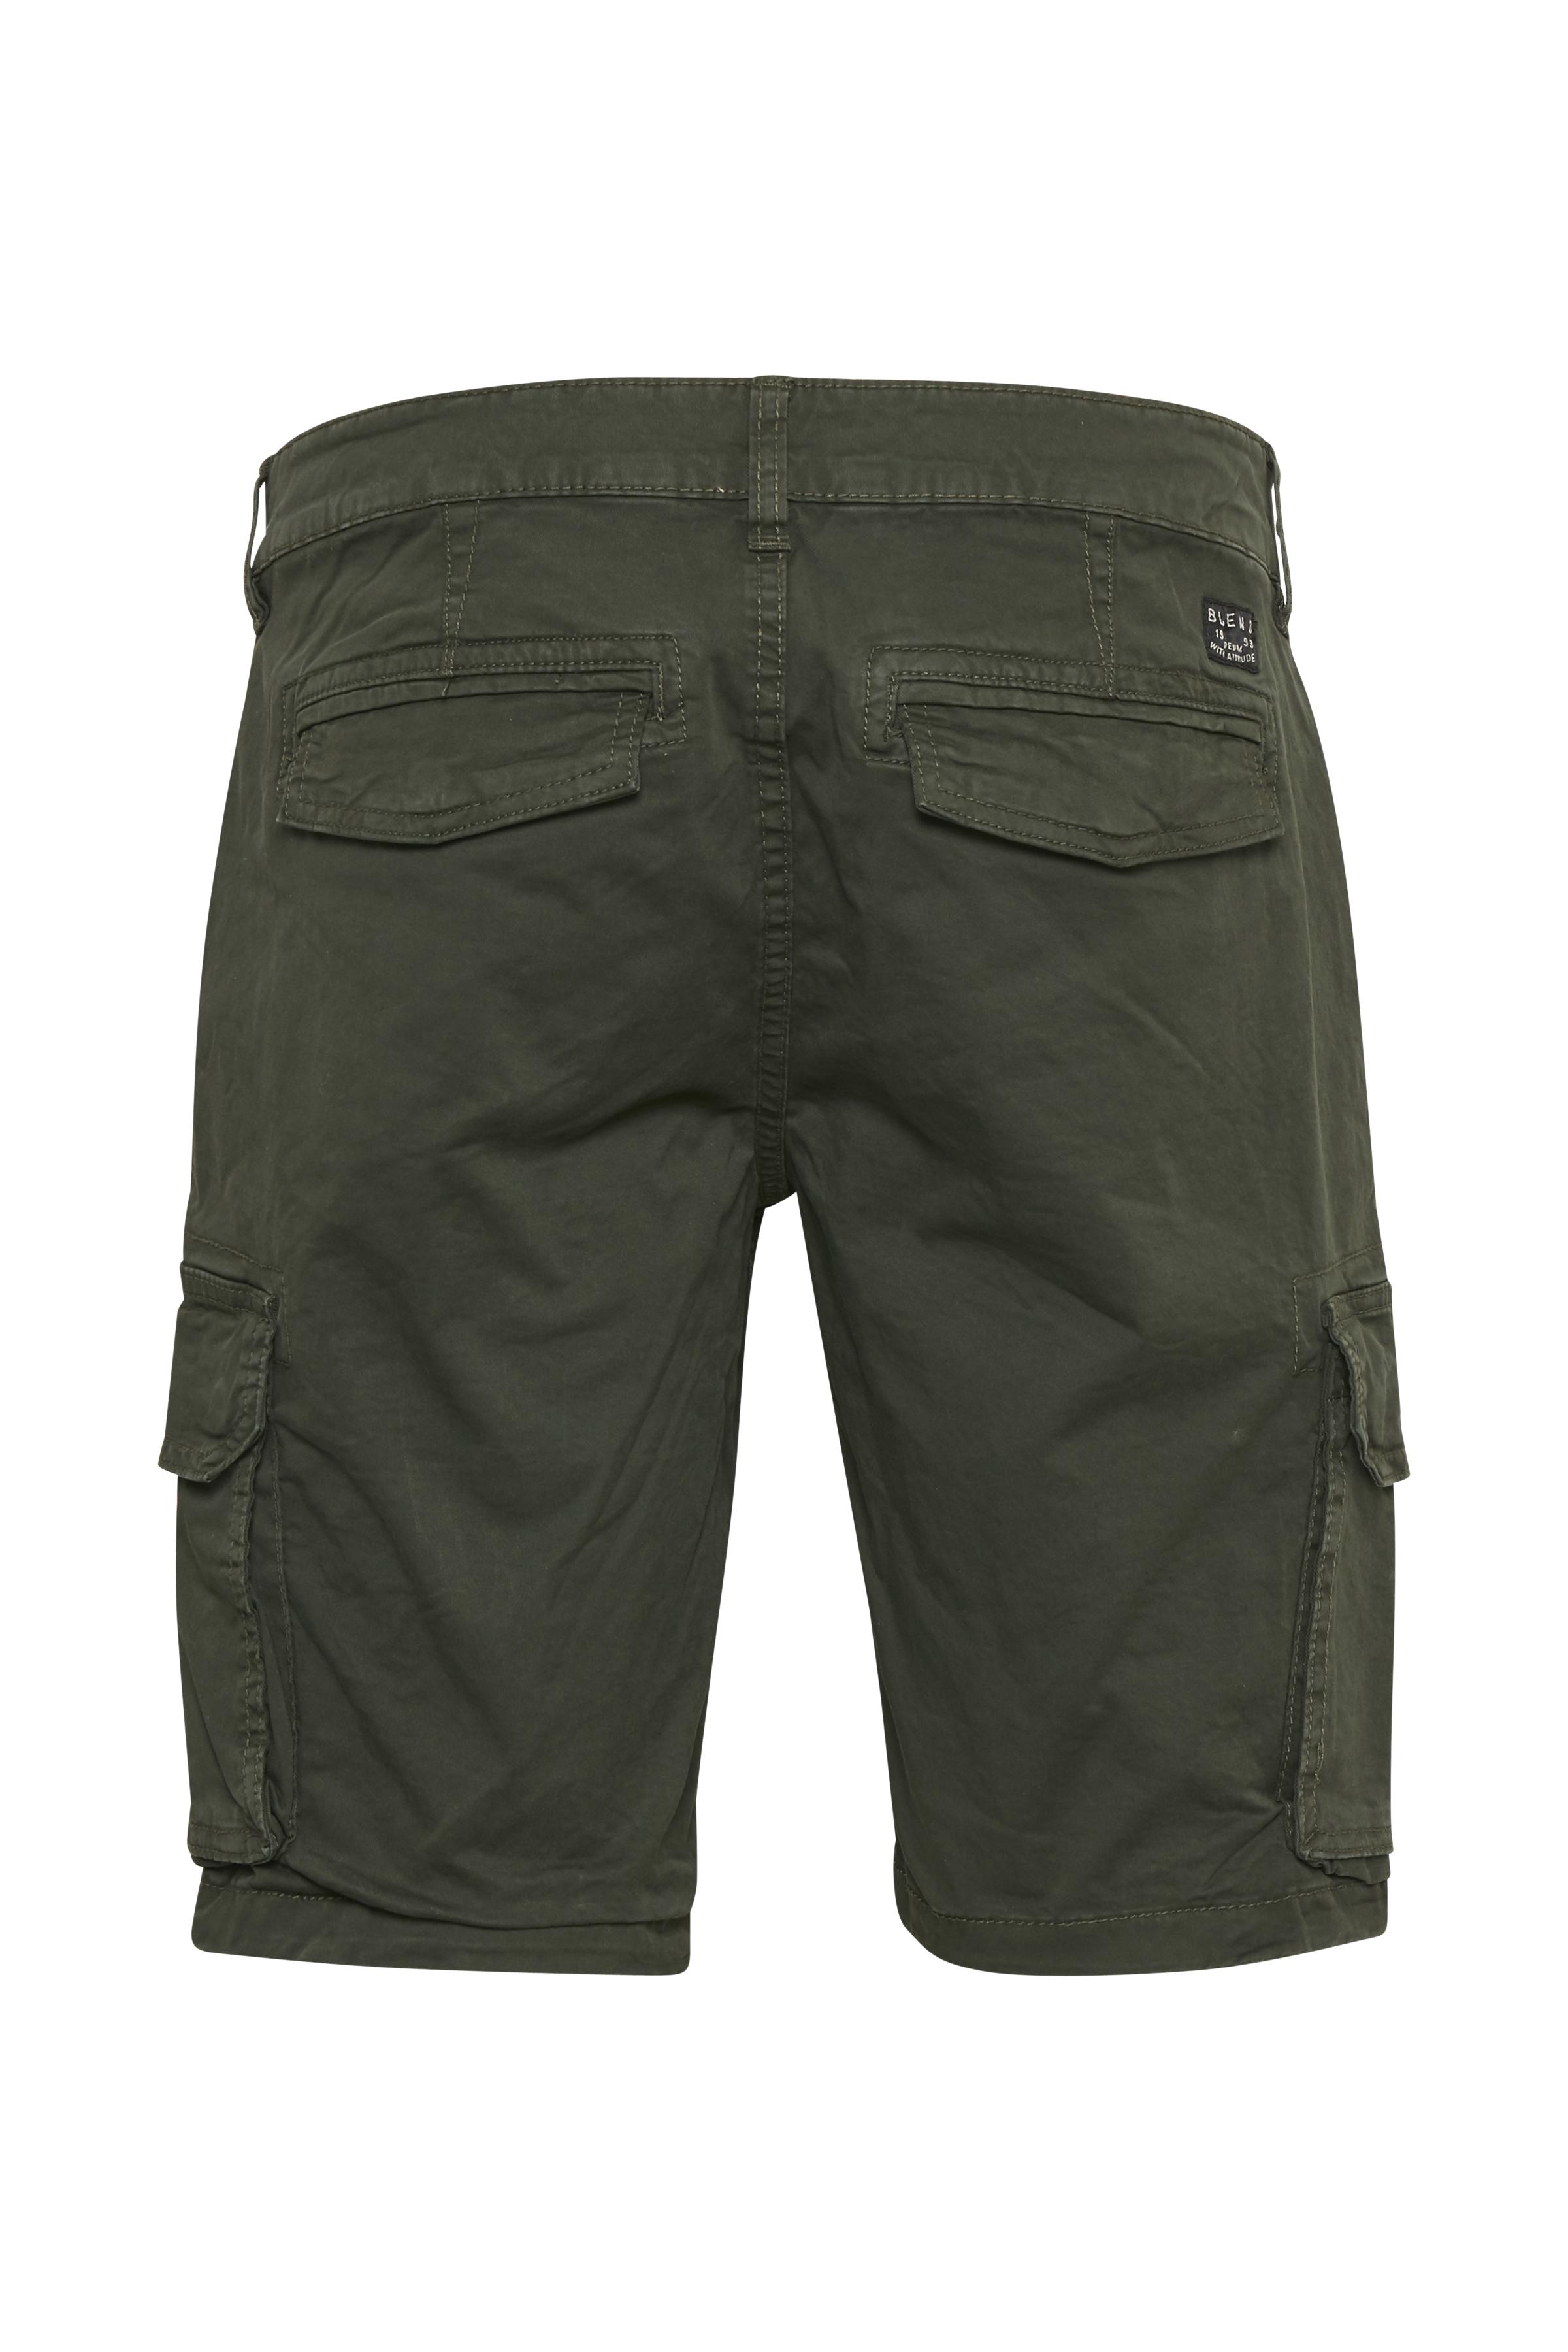 Rosin Green Shorts – Køb Rosin Green Shorts fra str. S-3XL her